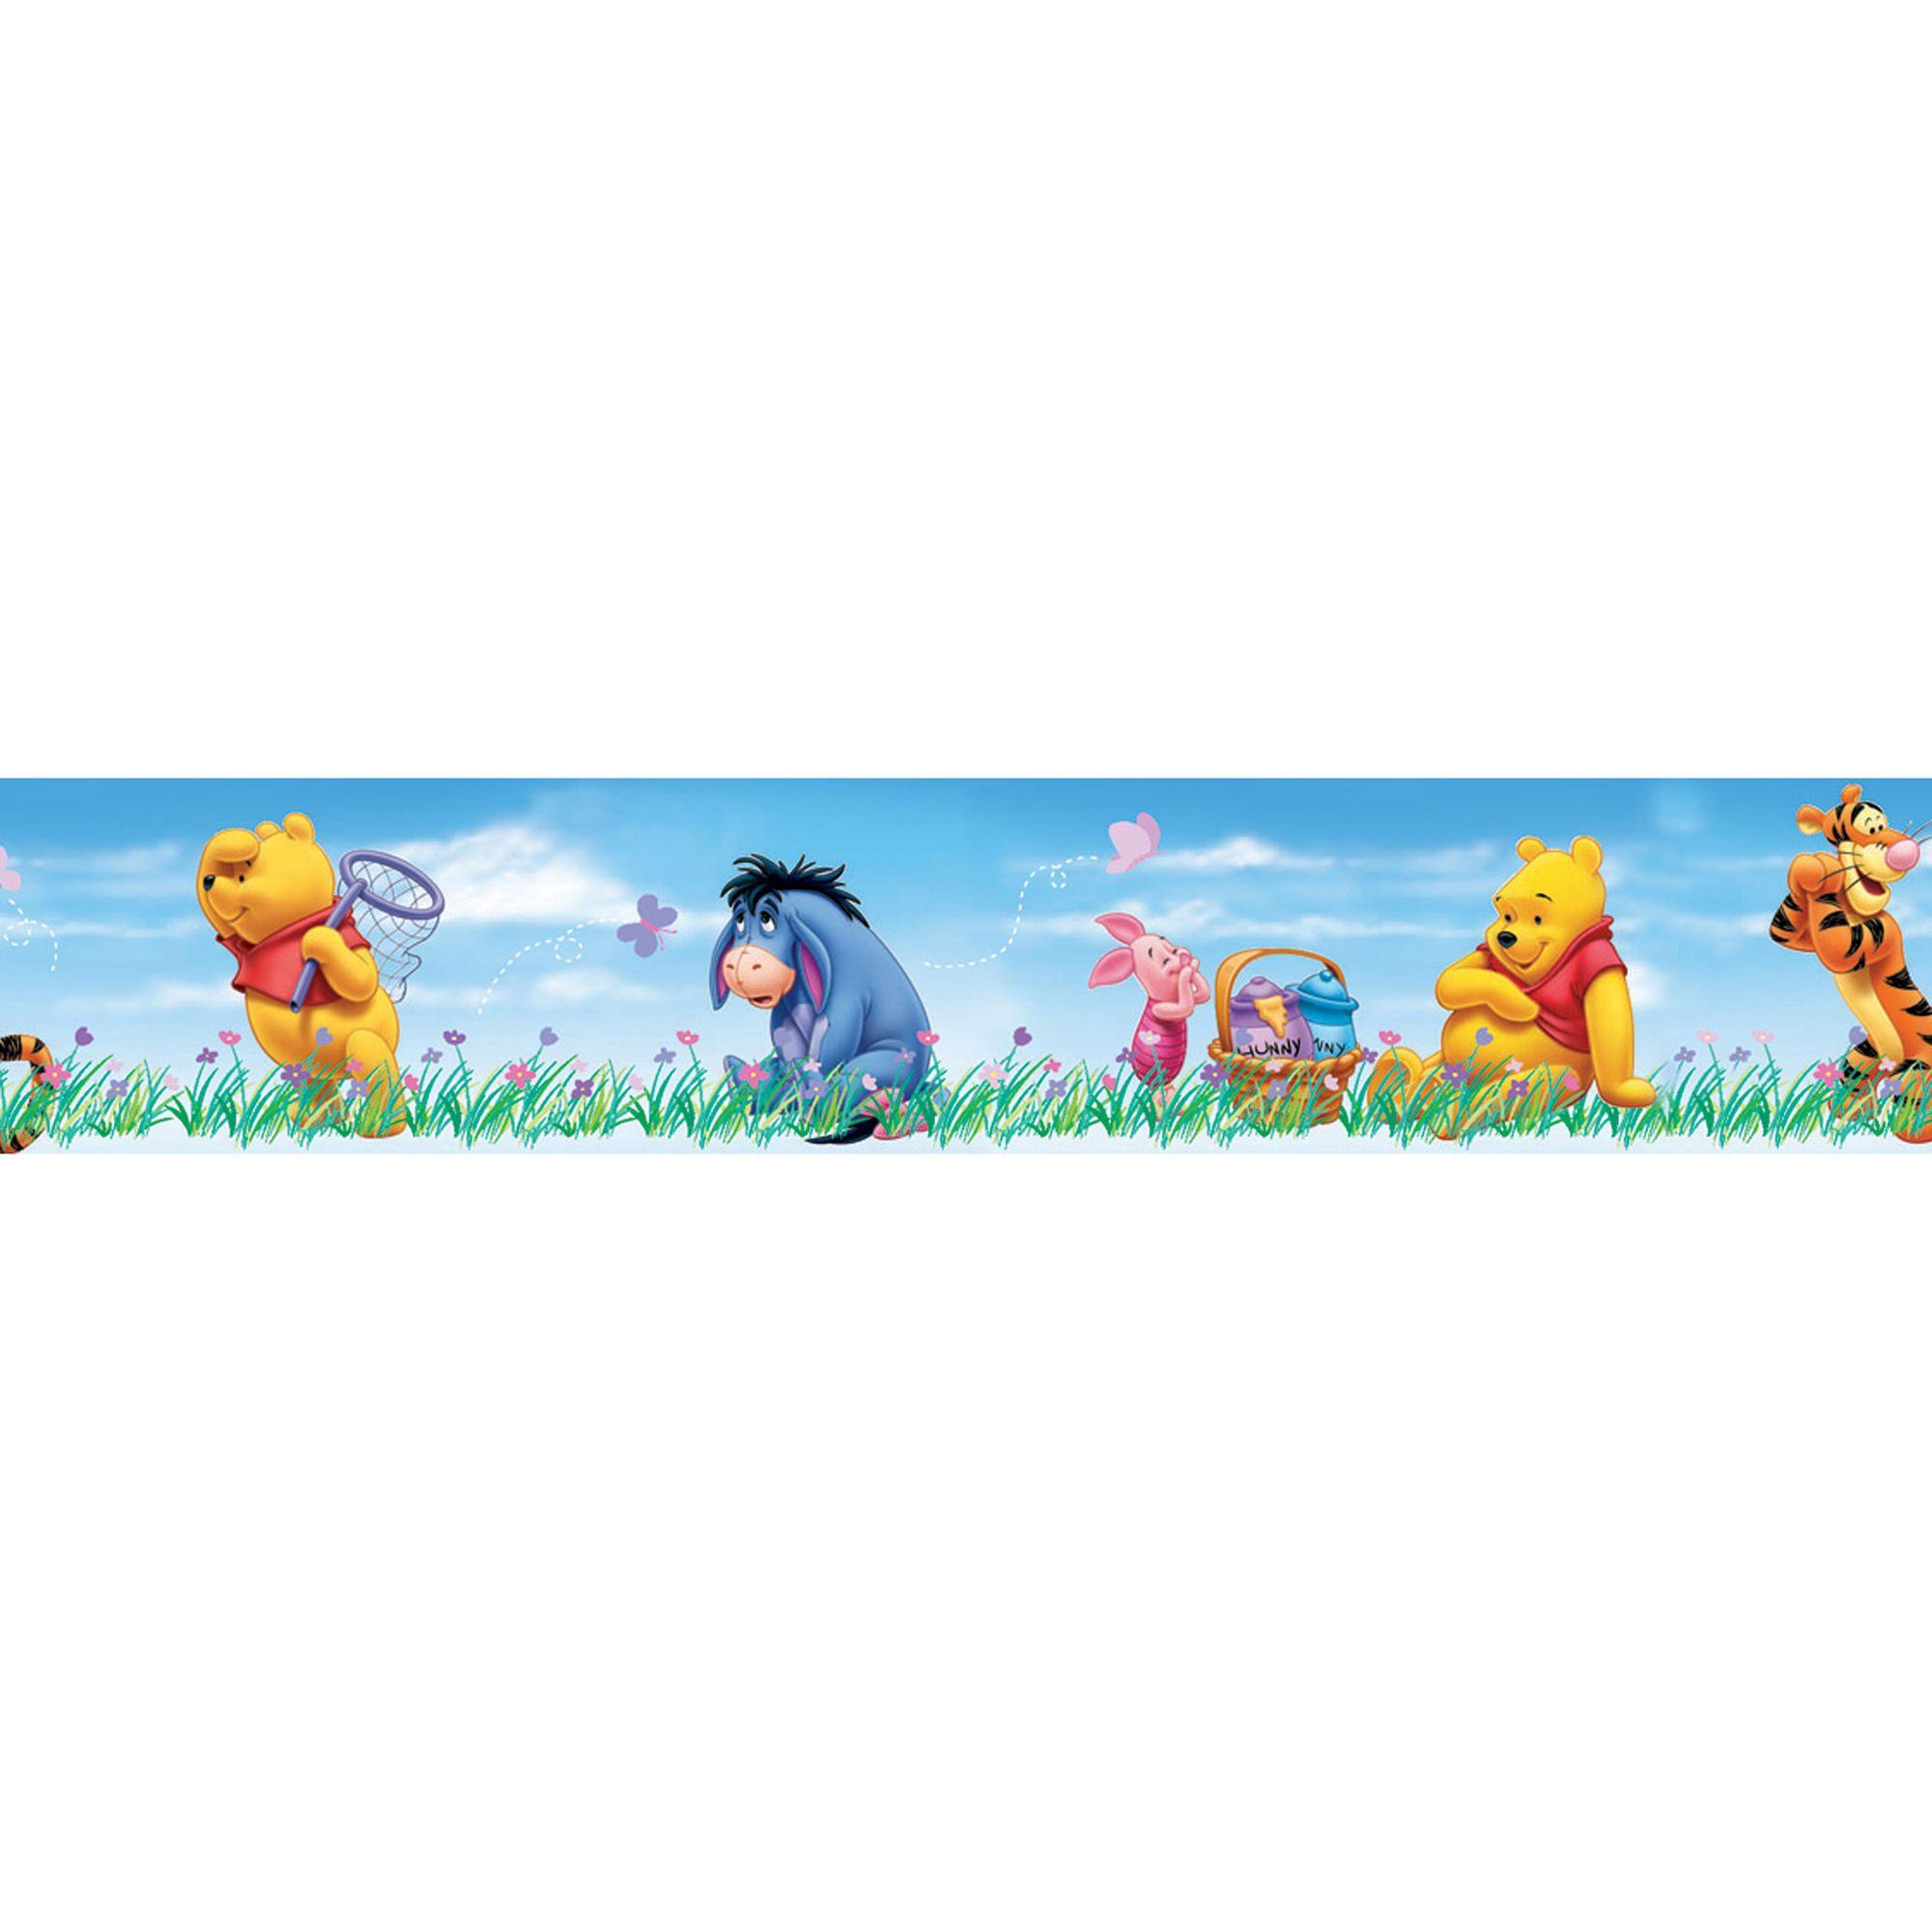 Baby Wall Sticker Disney Winnie The Pooh Multicolour Border Departments